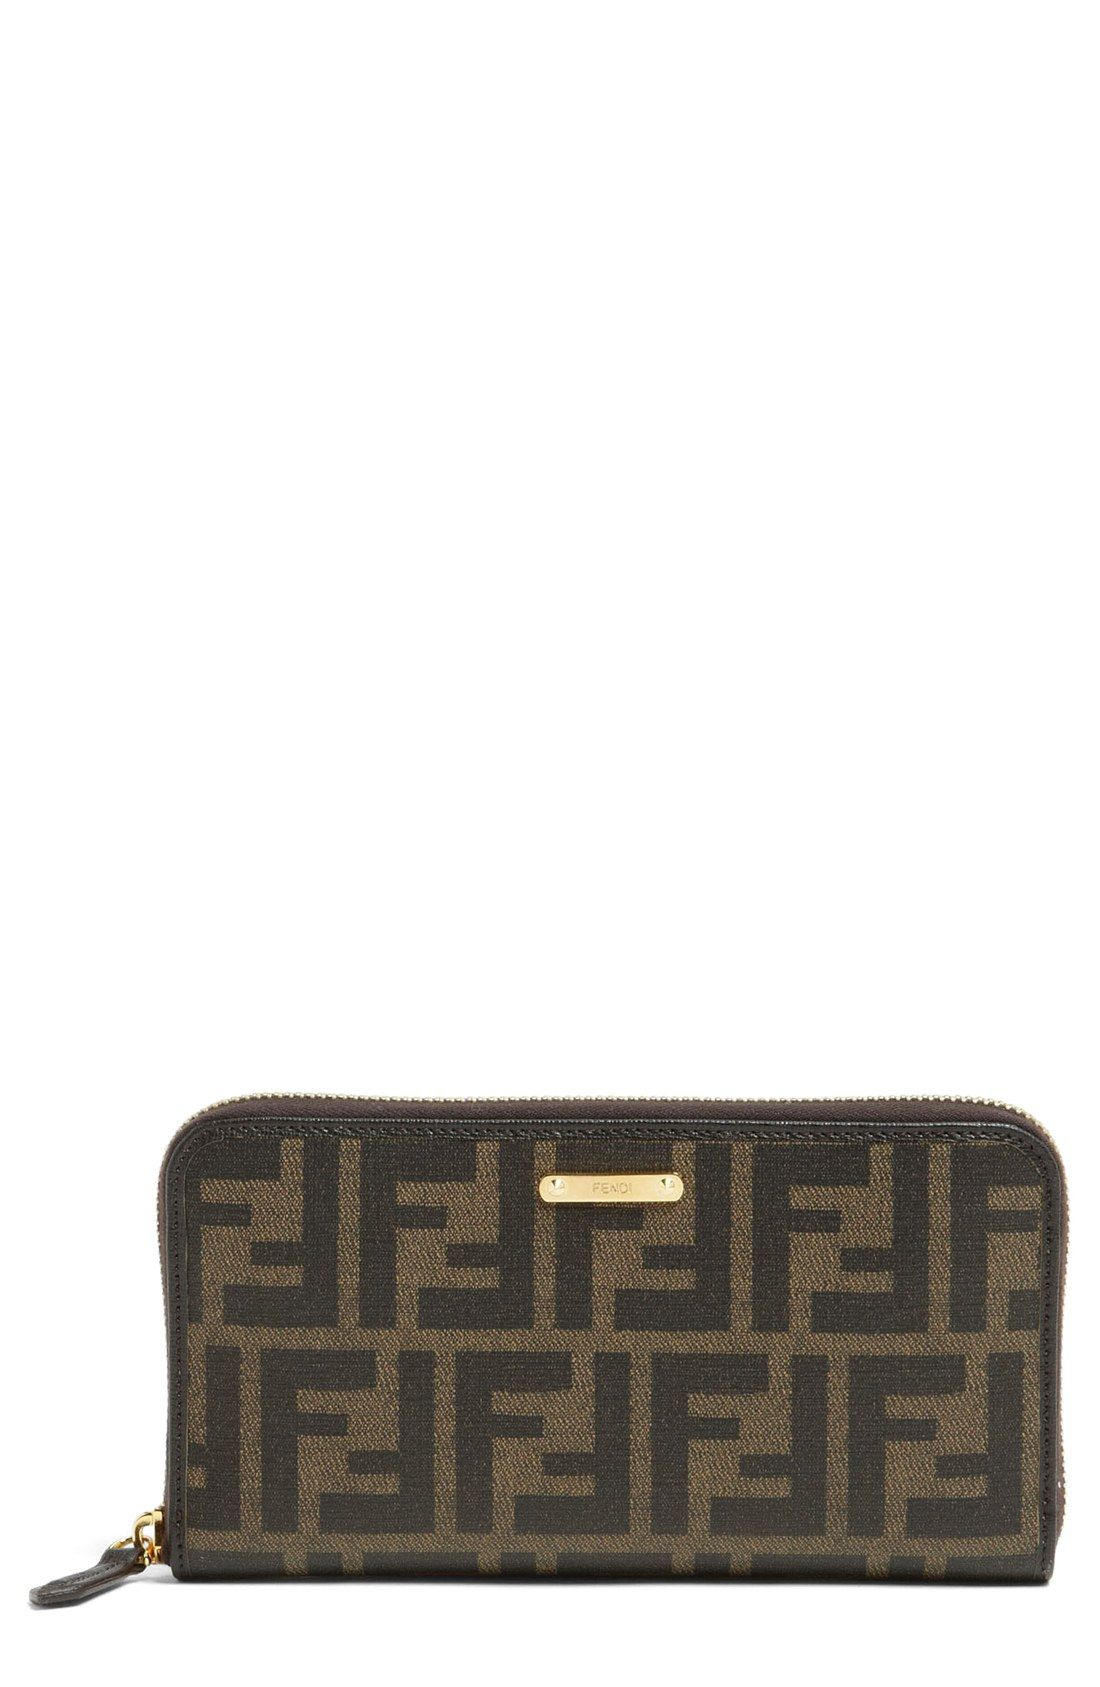 Fendi 'Zucca' Wallet Wallet, Fendi, Zip around wallet